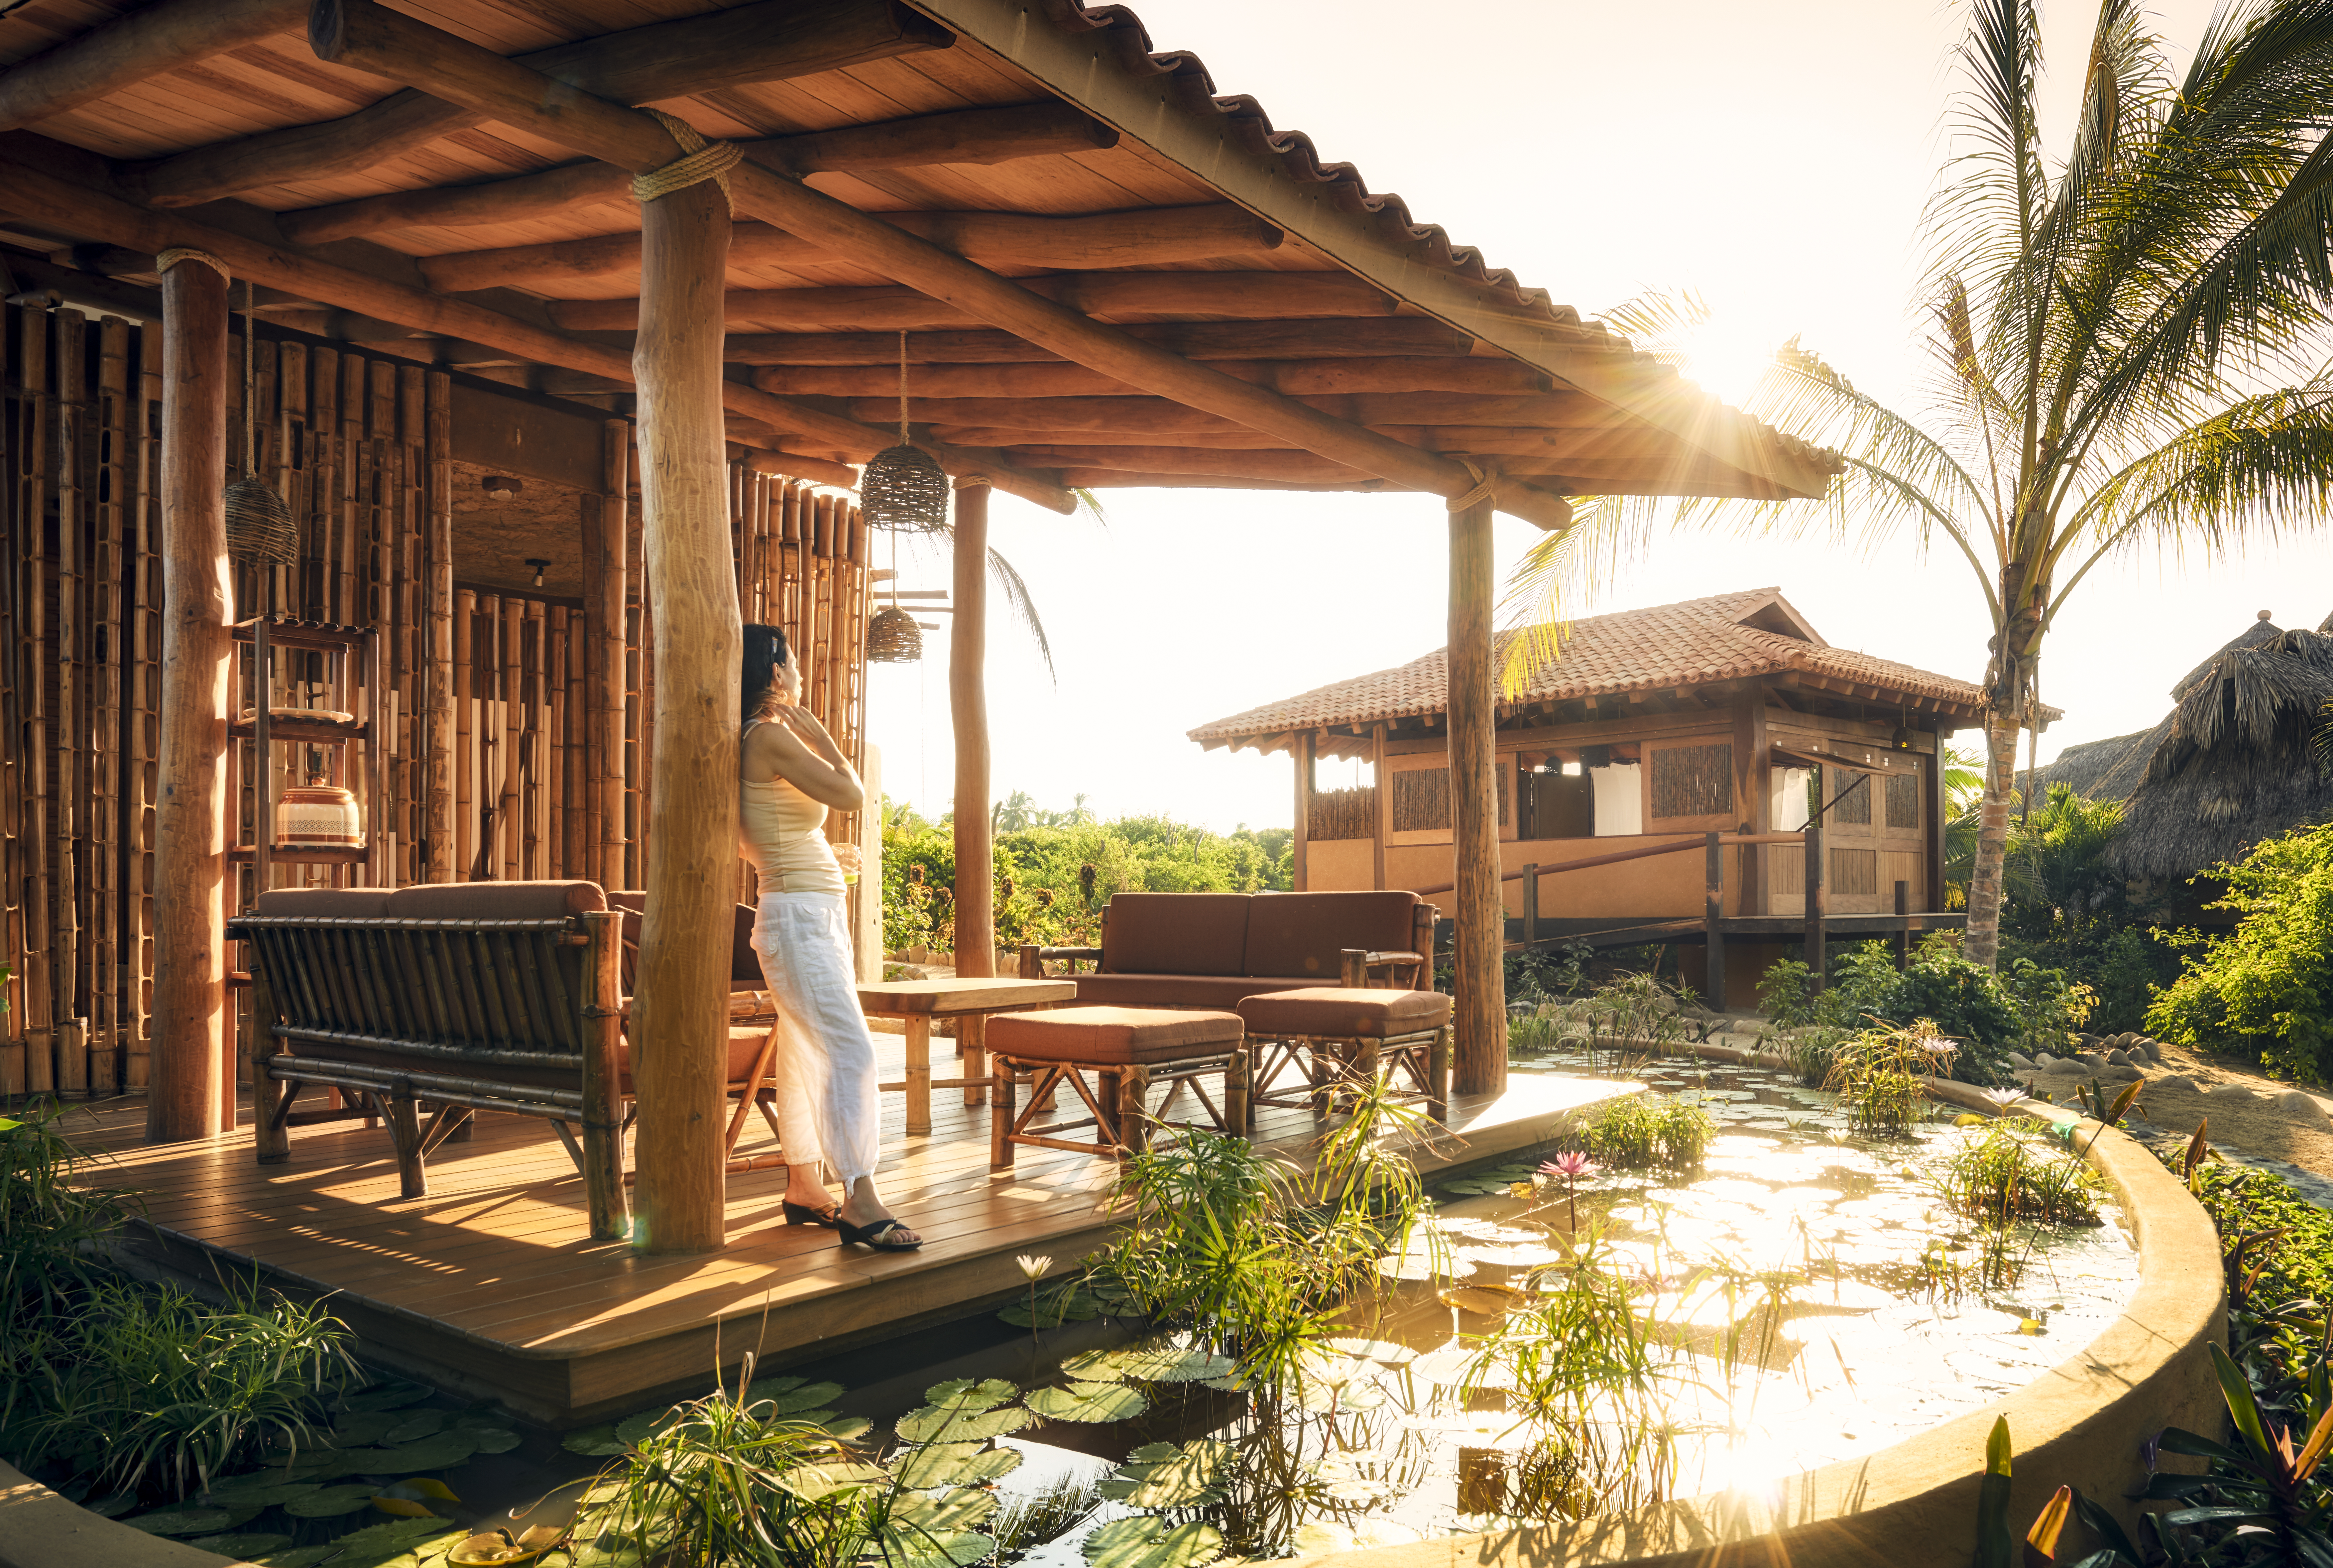 Photo courtesy of Playa Viva – Casita's  image  by kevsteele